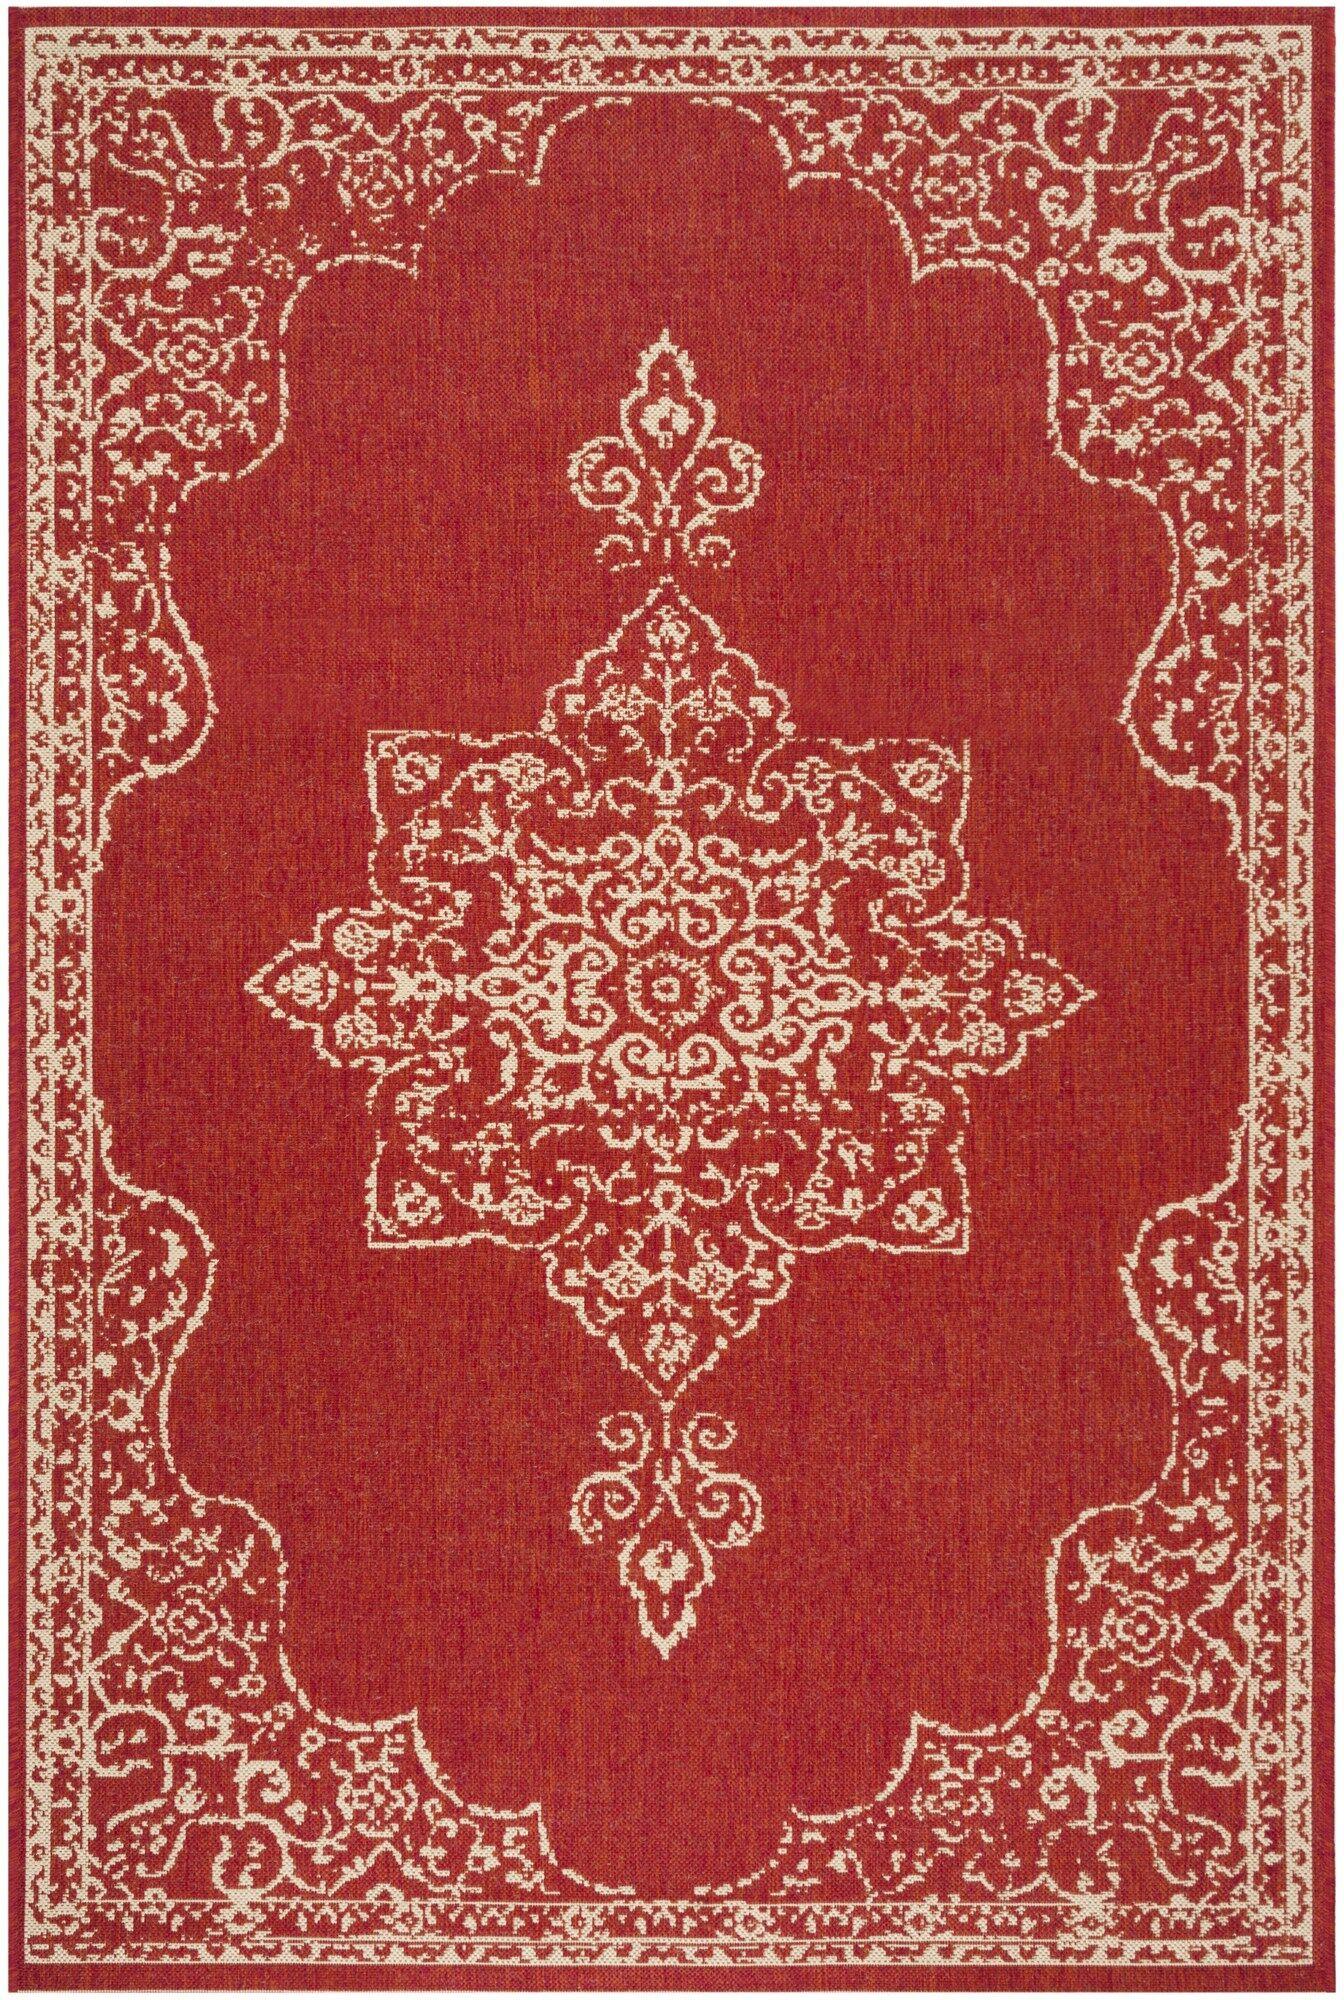 Karpinski Red/Cream Area Rug Rug Size: Rectangle 9' x 12'